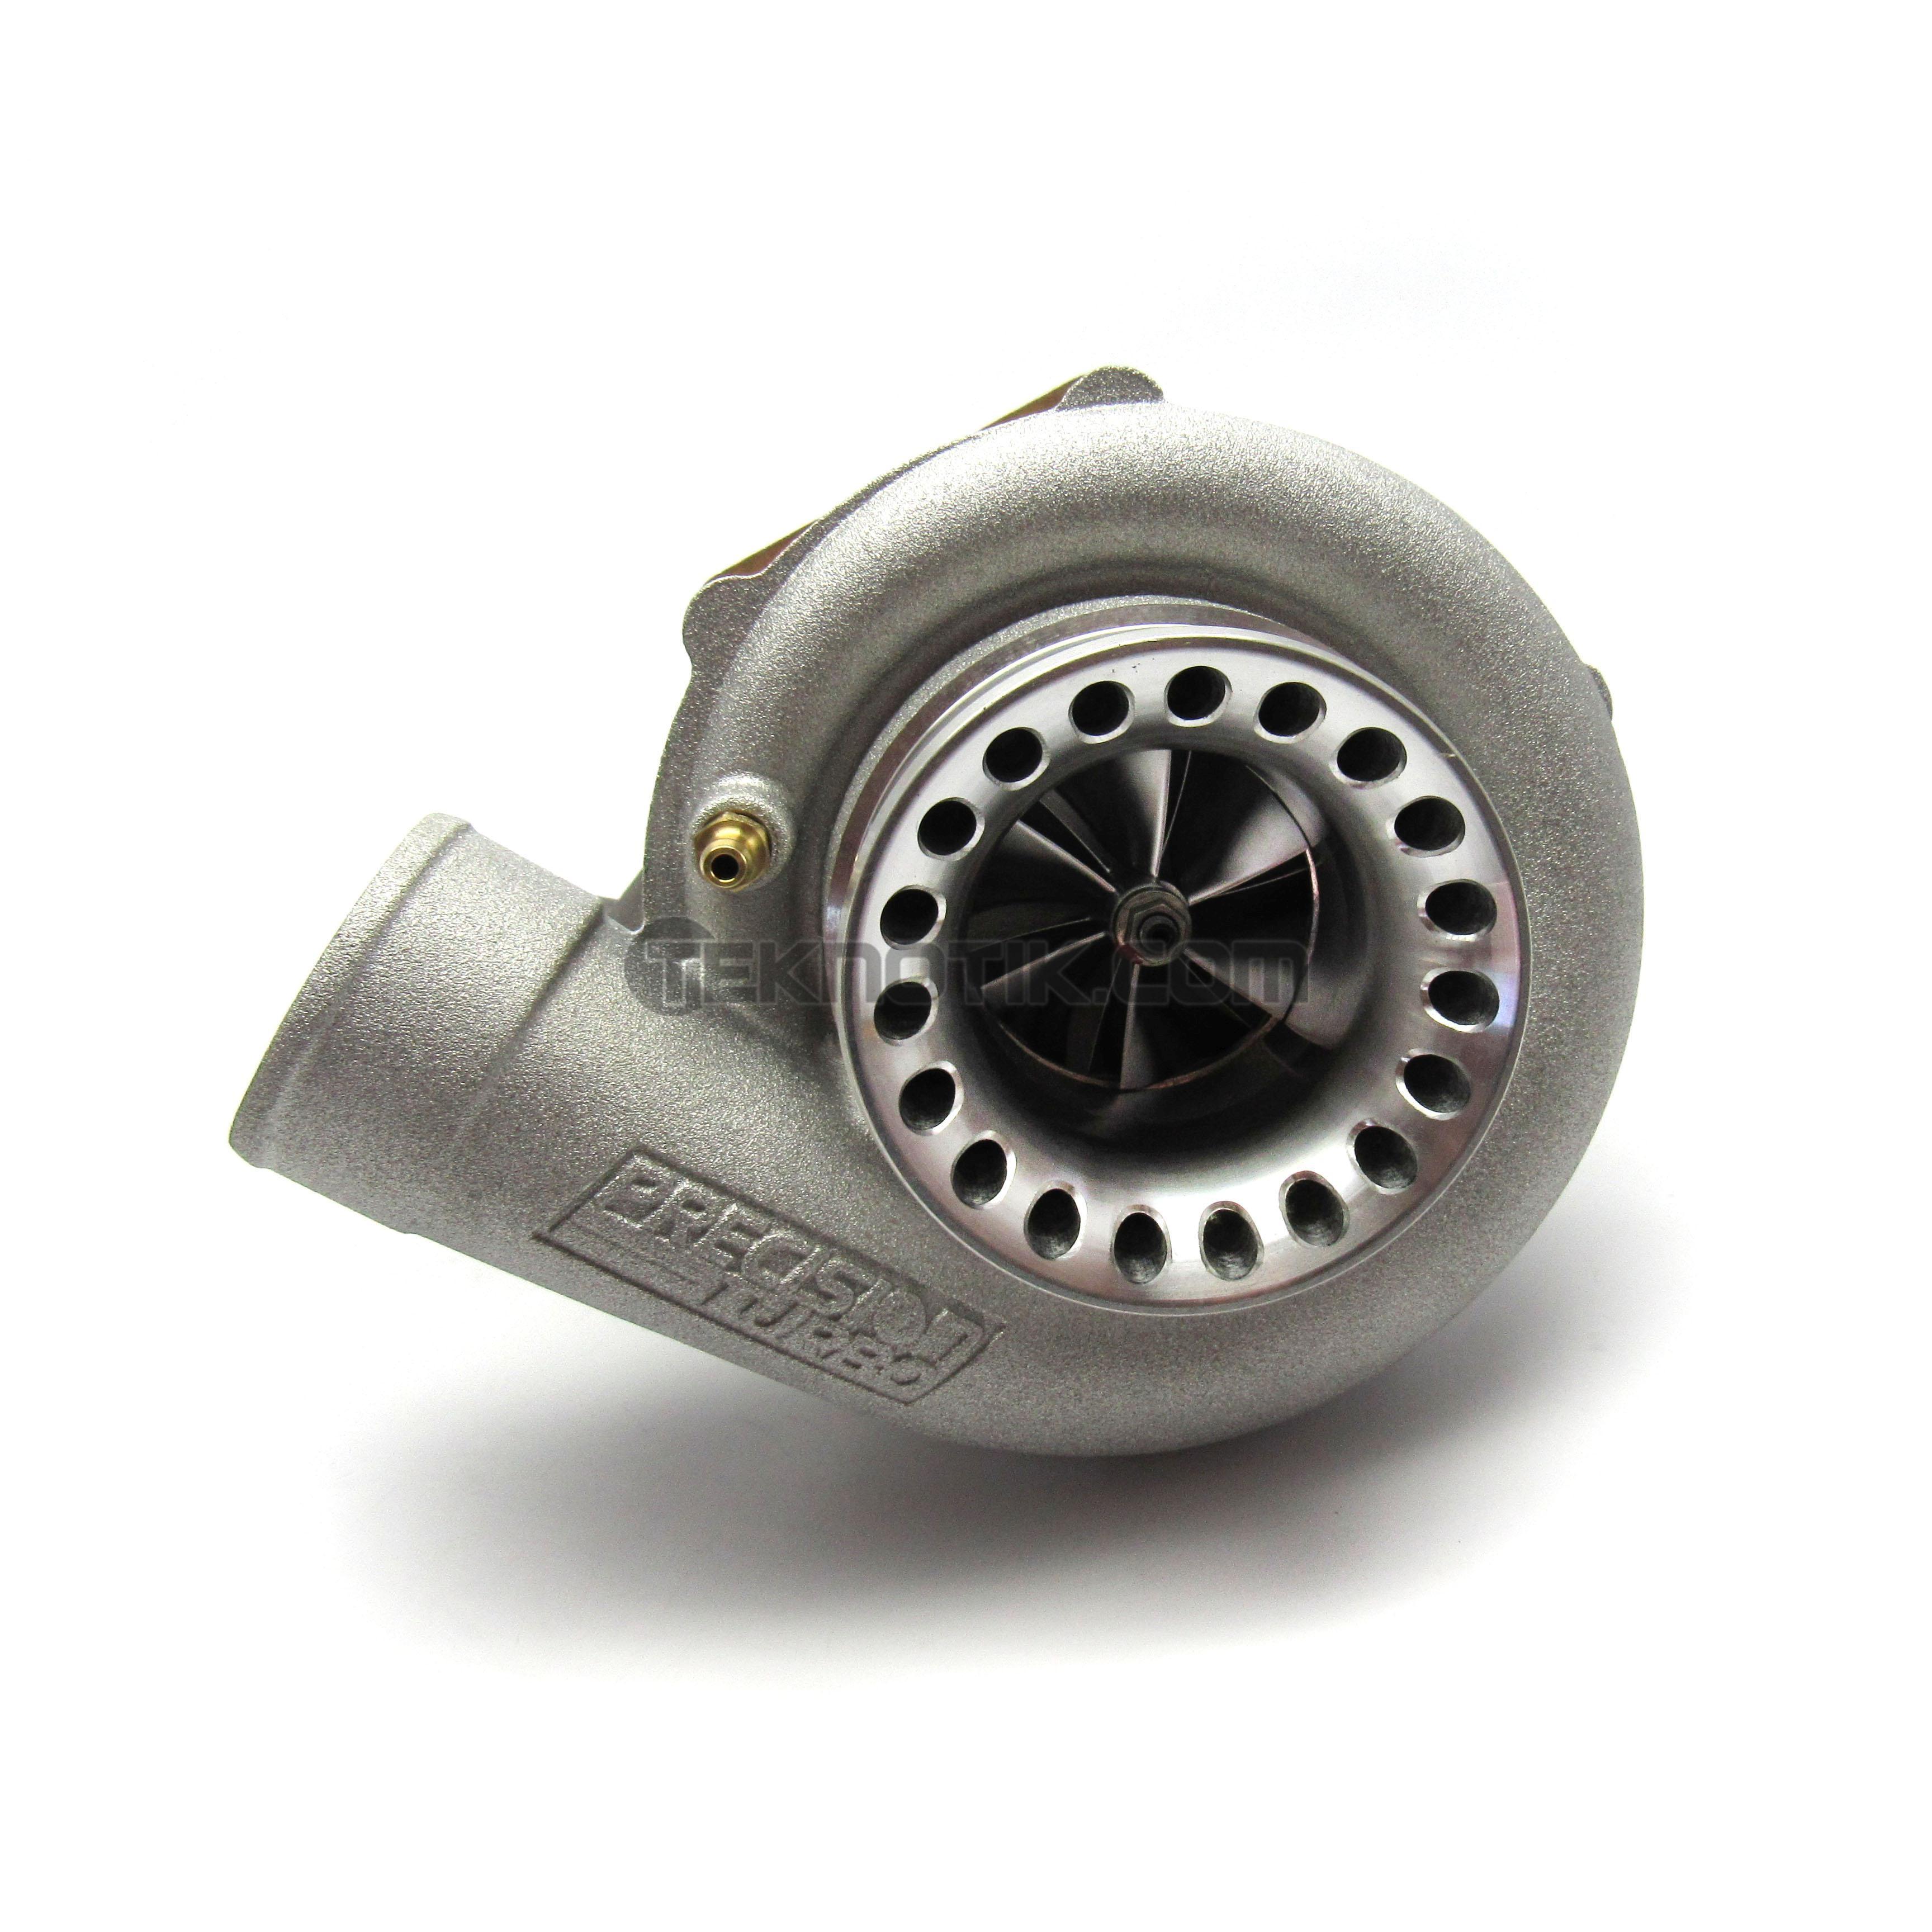 Precision 6262 Cea: Precision Street And Race Turbocharger PT6262 CEA Teknotik